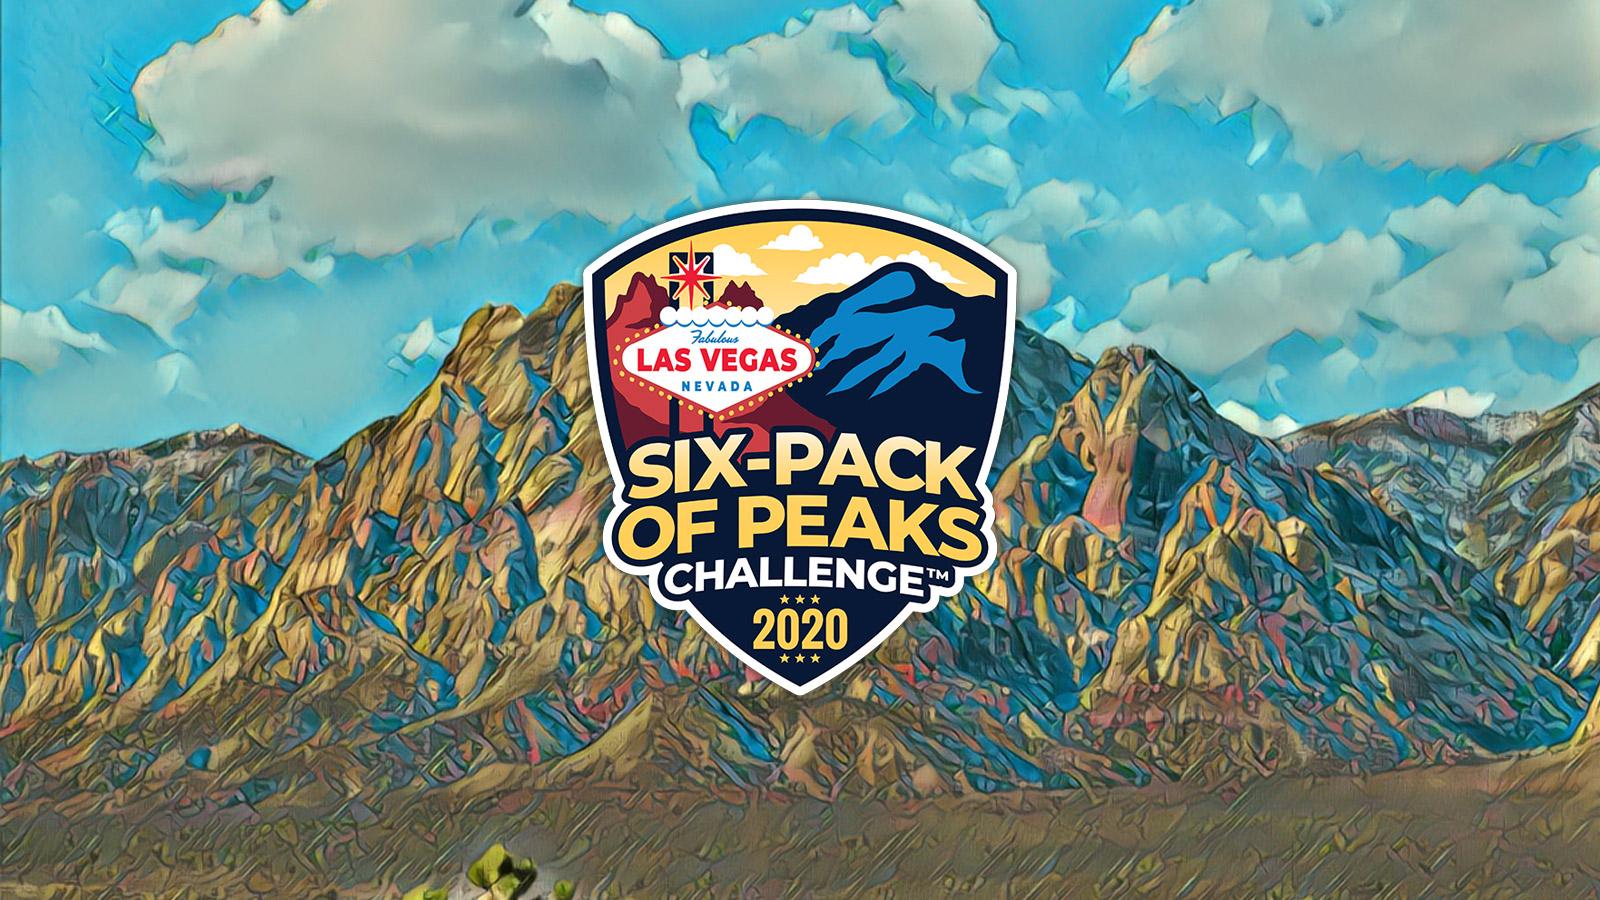 2021 Las Vegas Six-Pack of Peaks Challenge Discussion Forum